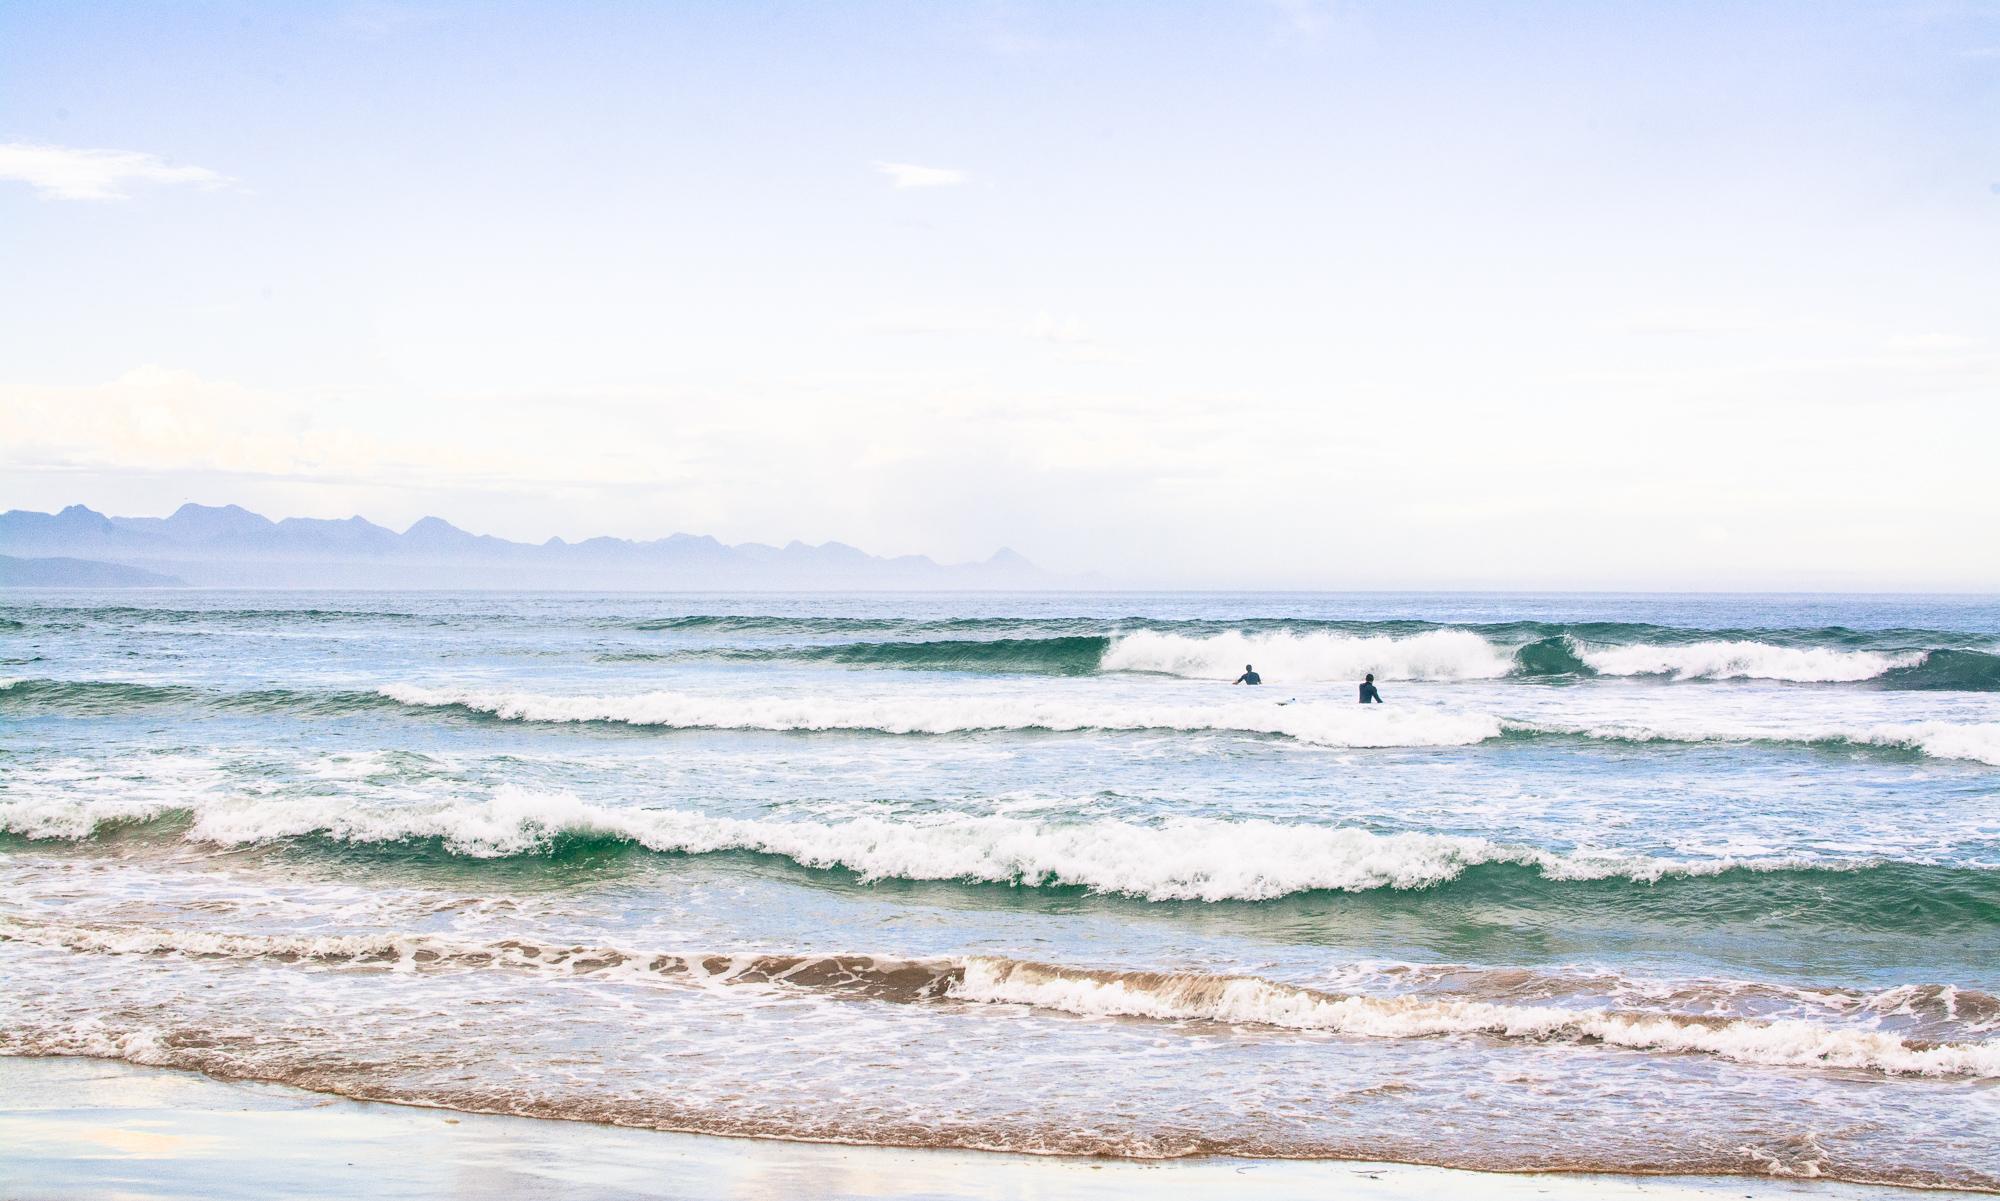 Plettenberg Bay, South Africa  February 2017